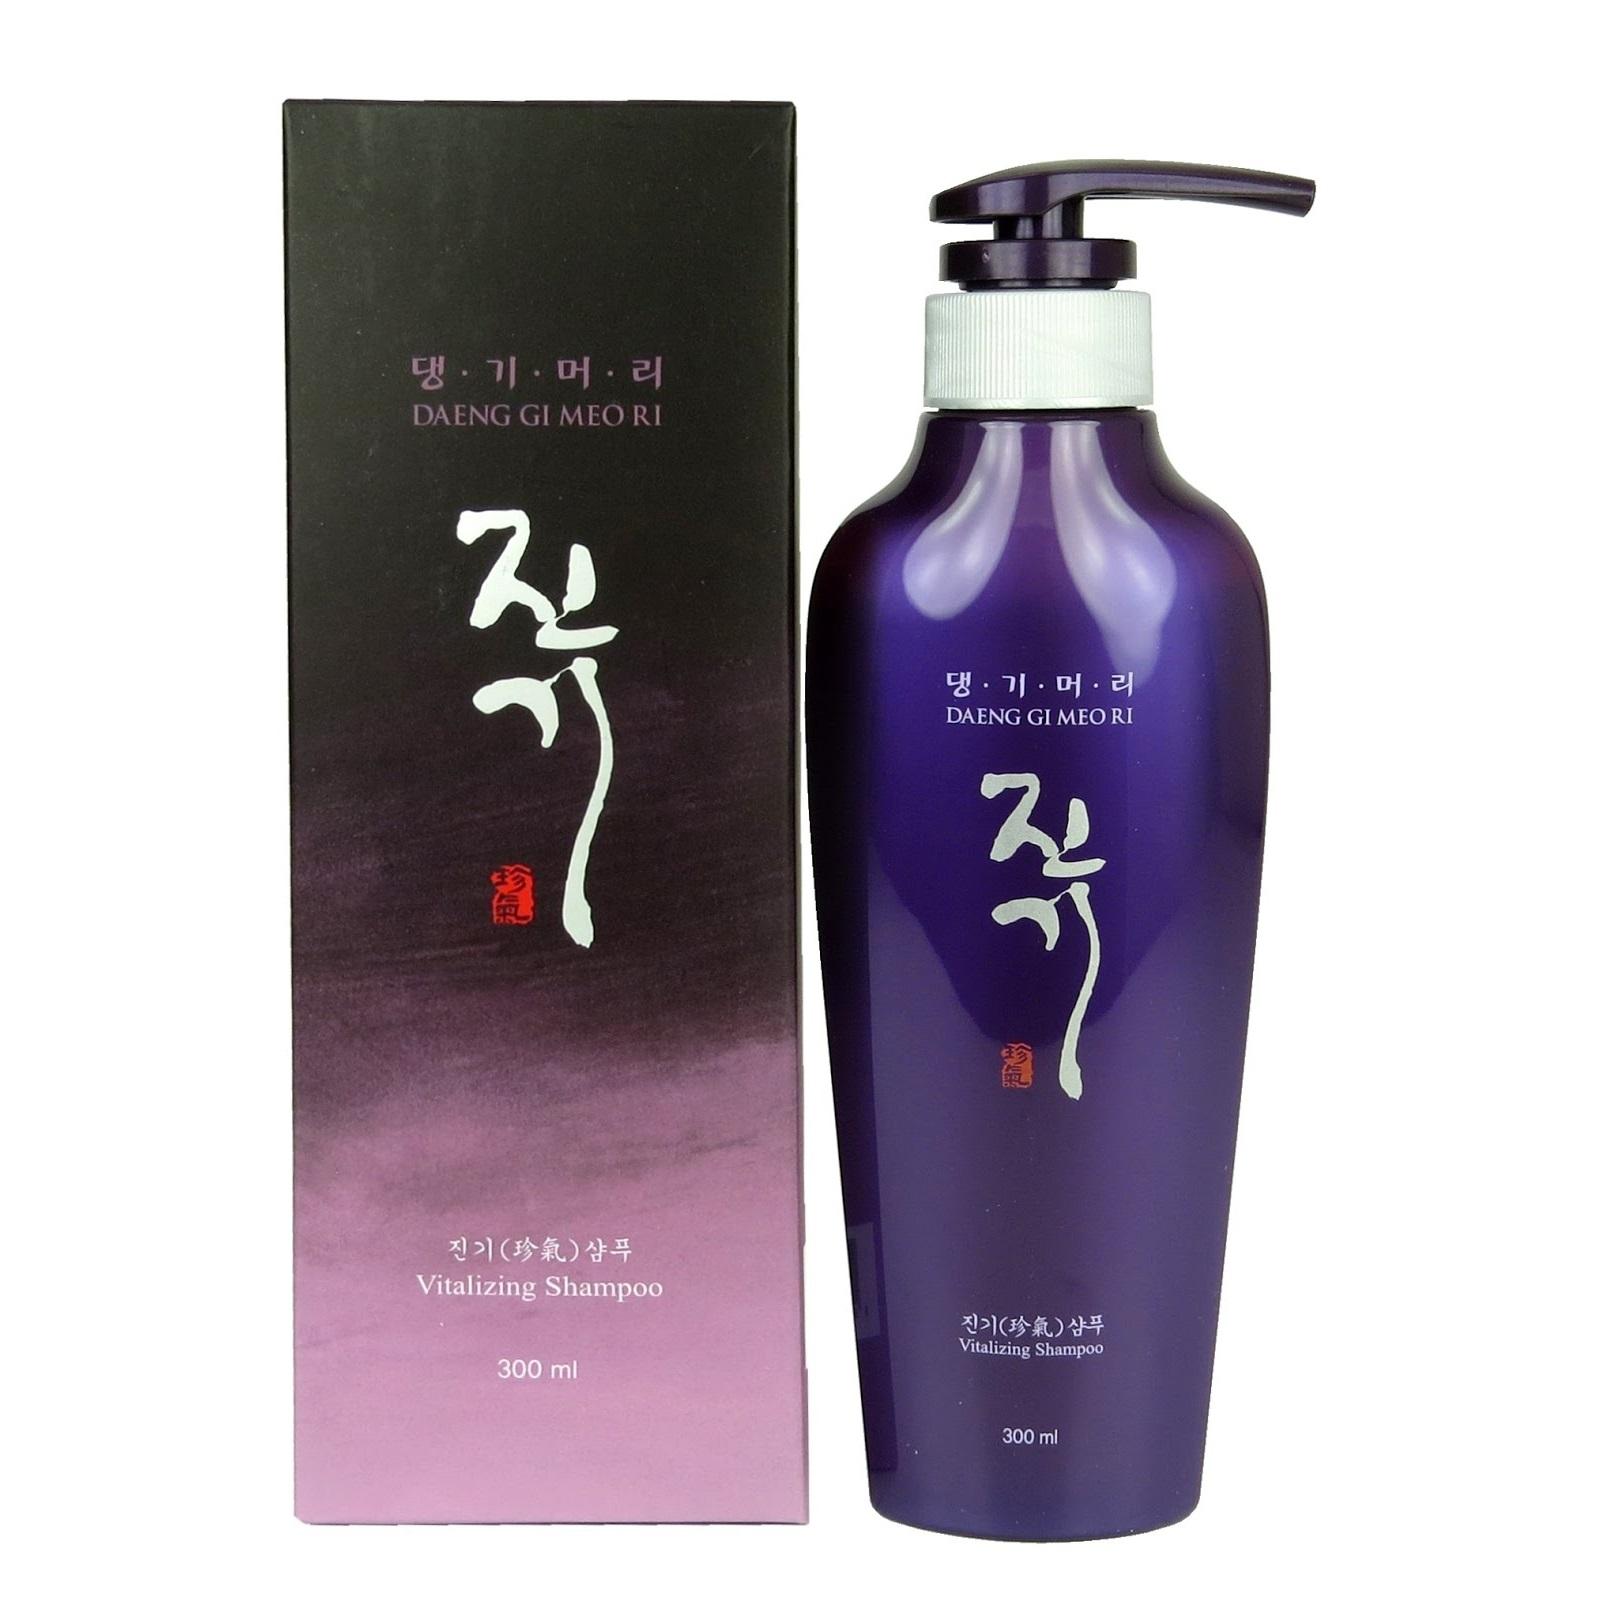 Купить Шампуни Daeng Gi Meo Ri, Шампунь Daeng Gi Meo Ri Vitalizing Shampoo Регенерирующий 300 мл